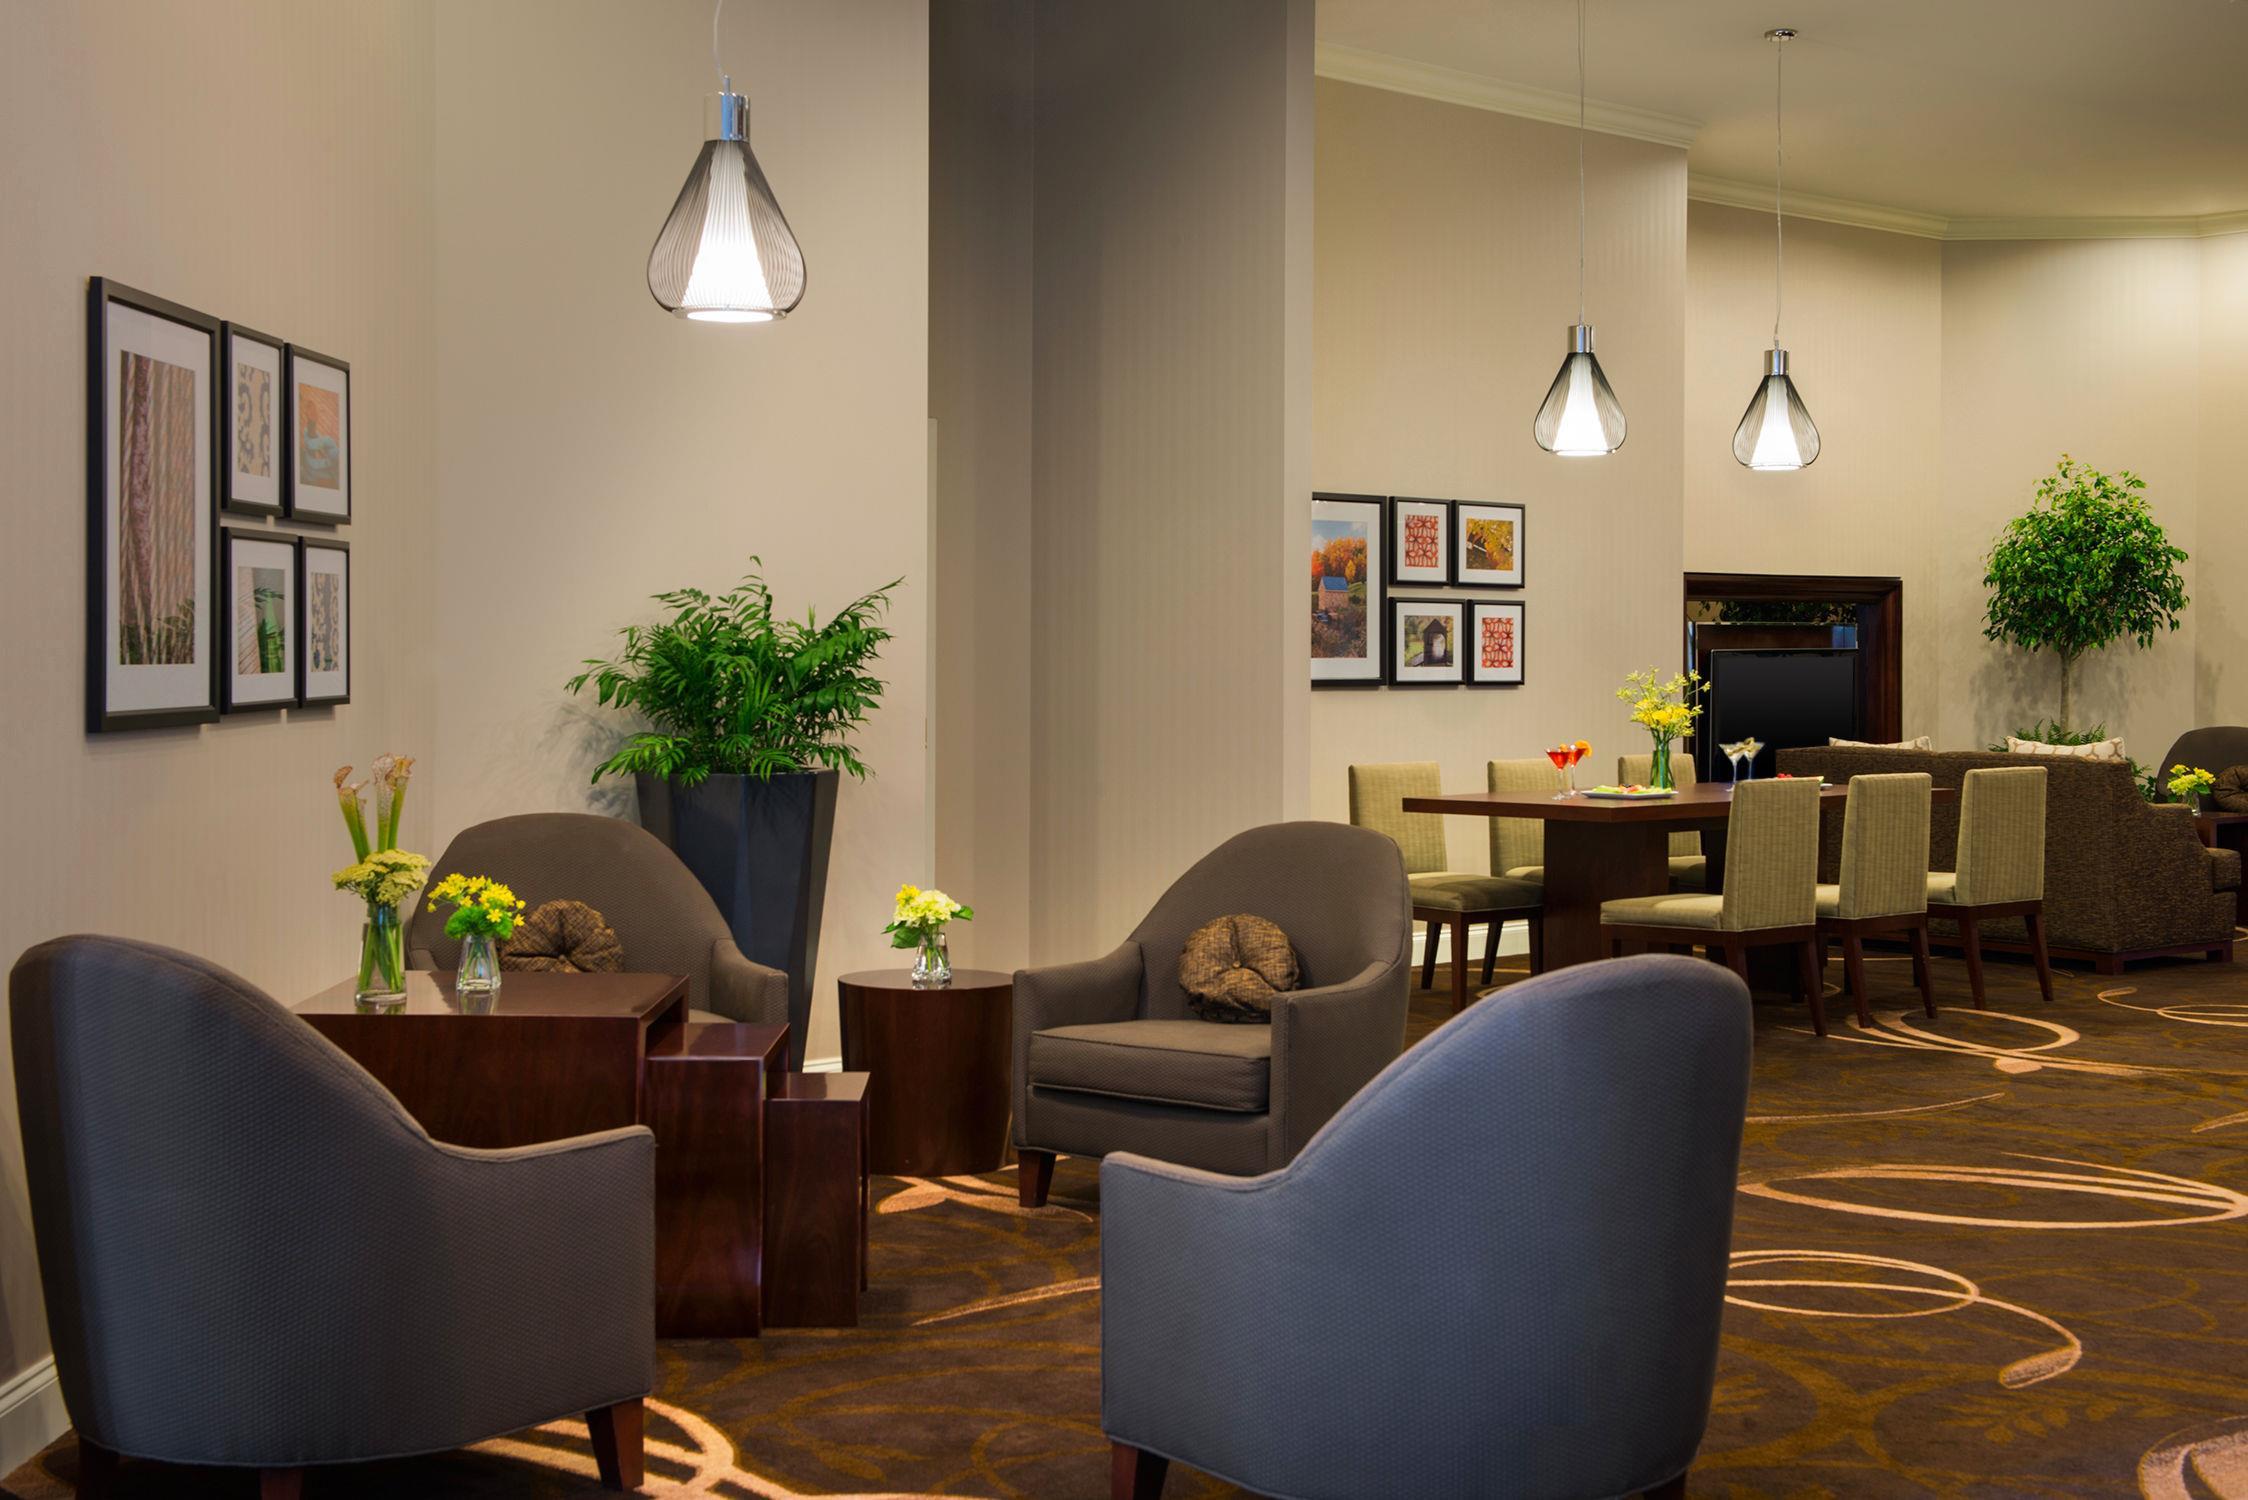 Sheraton Wilmington South Hotel image 1